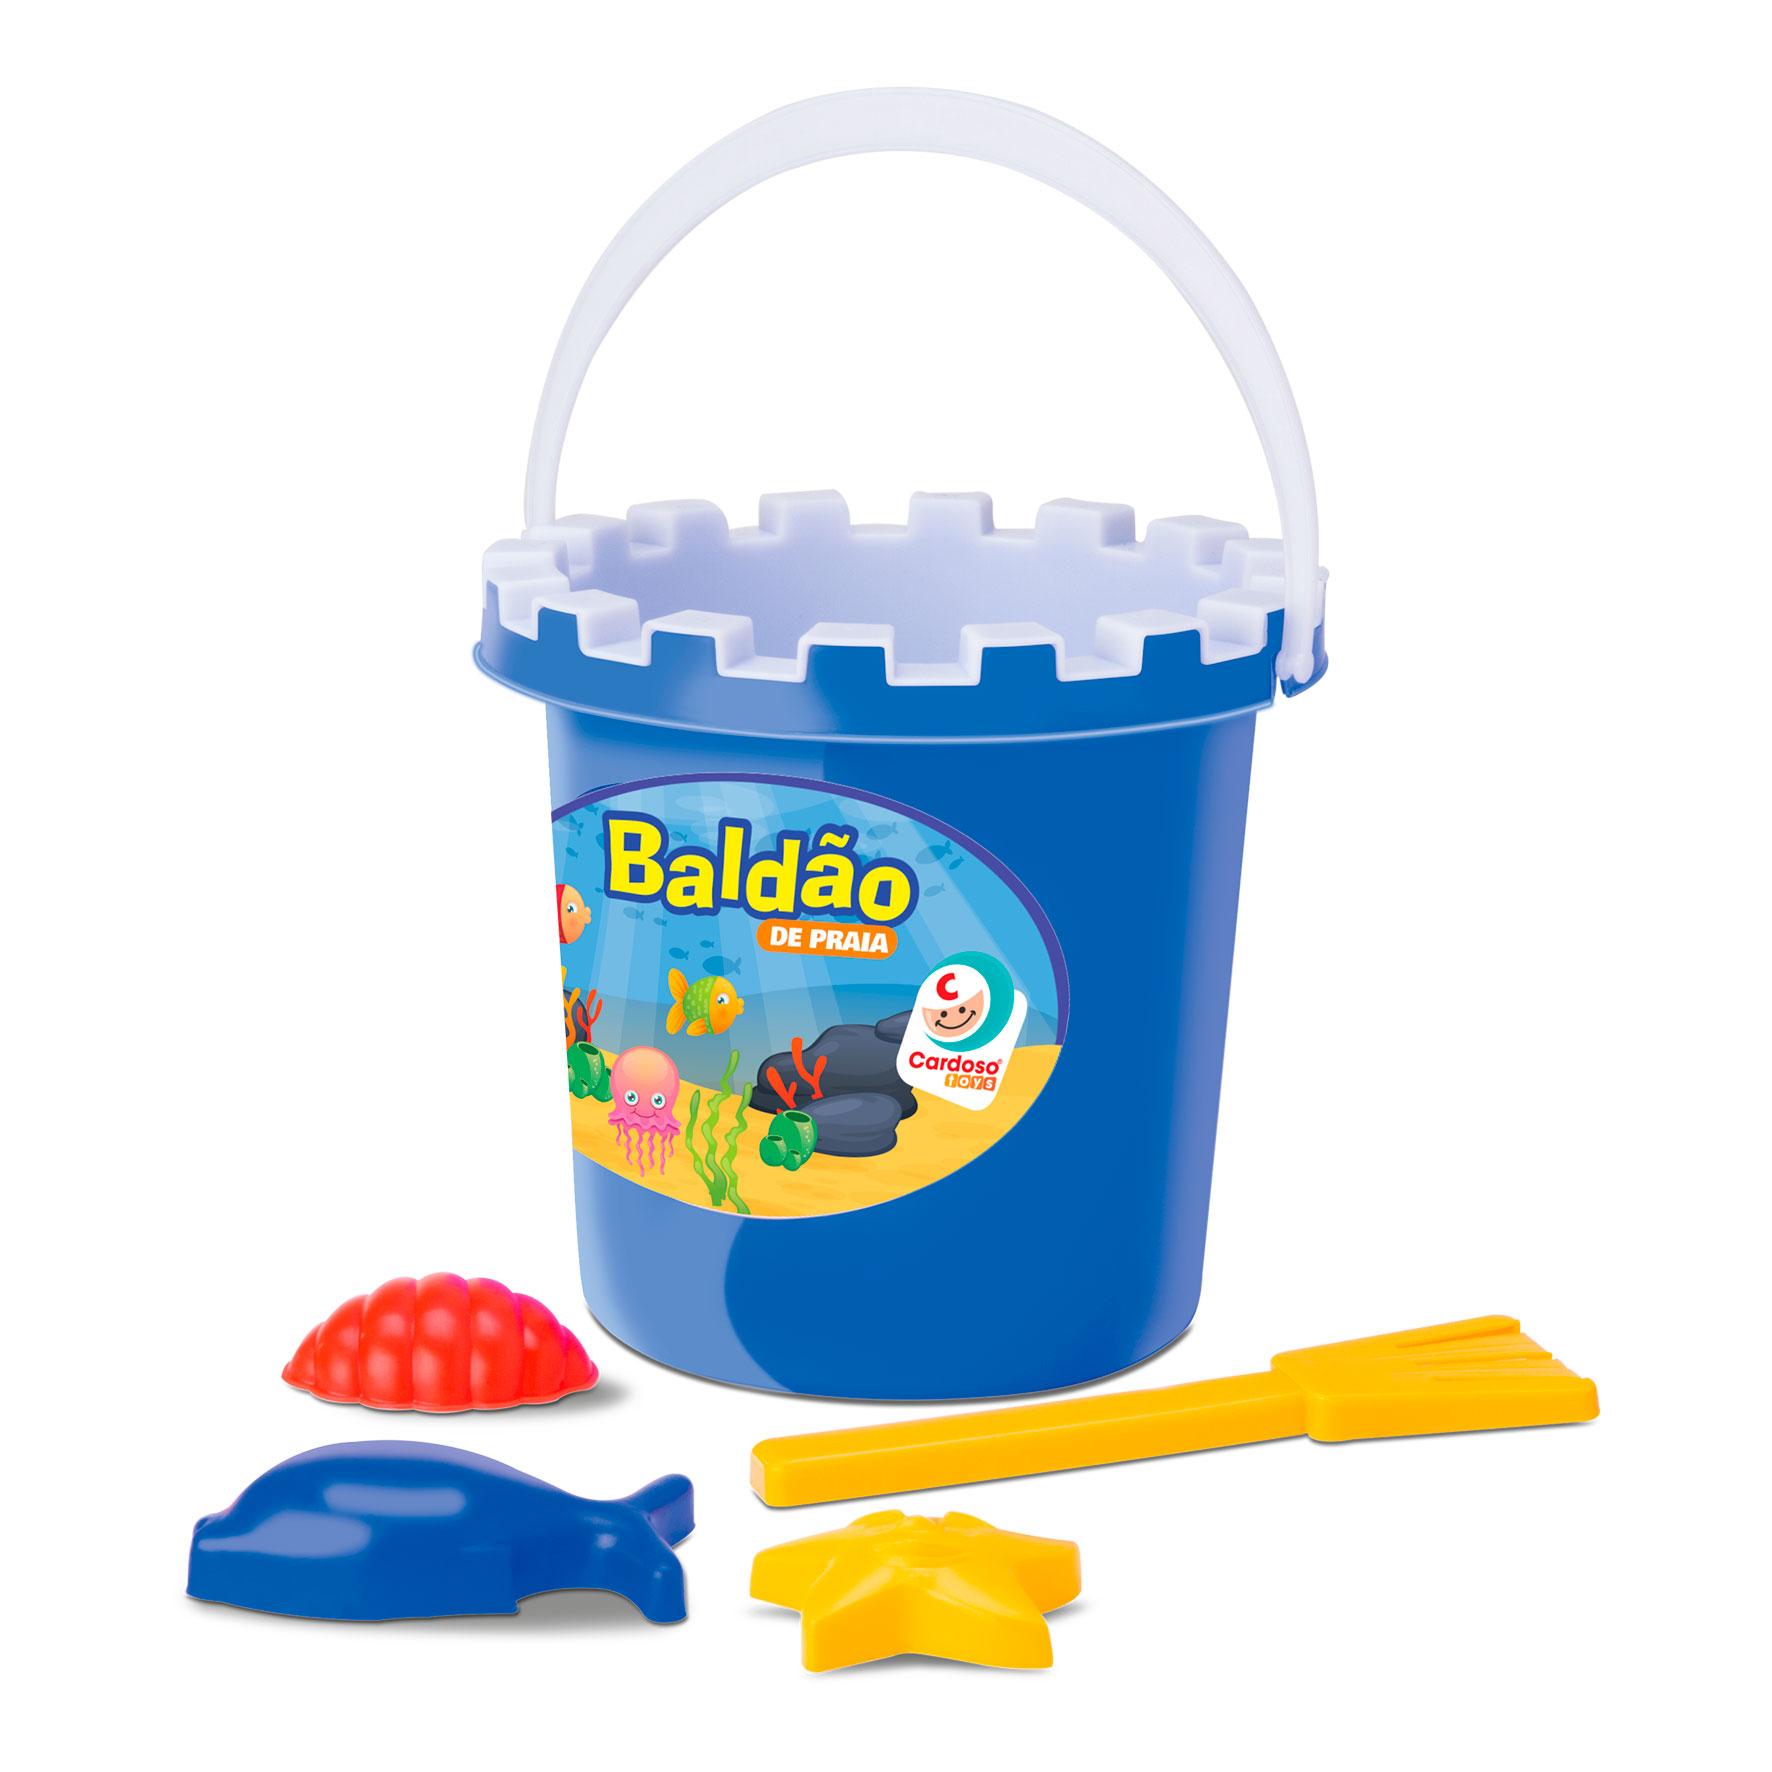 Balde de Praia para Bebês - Cardoso Toys